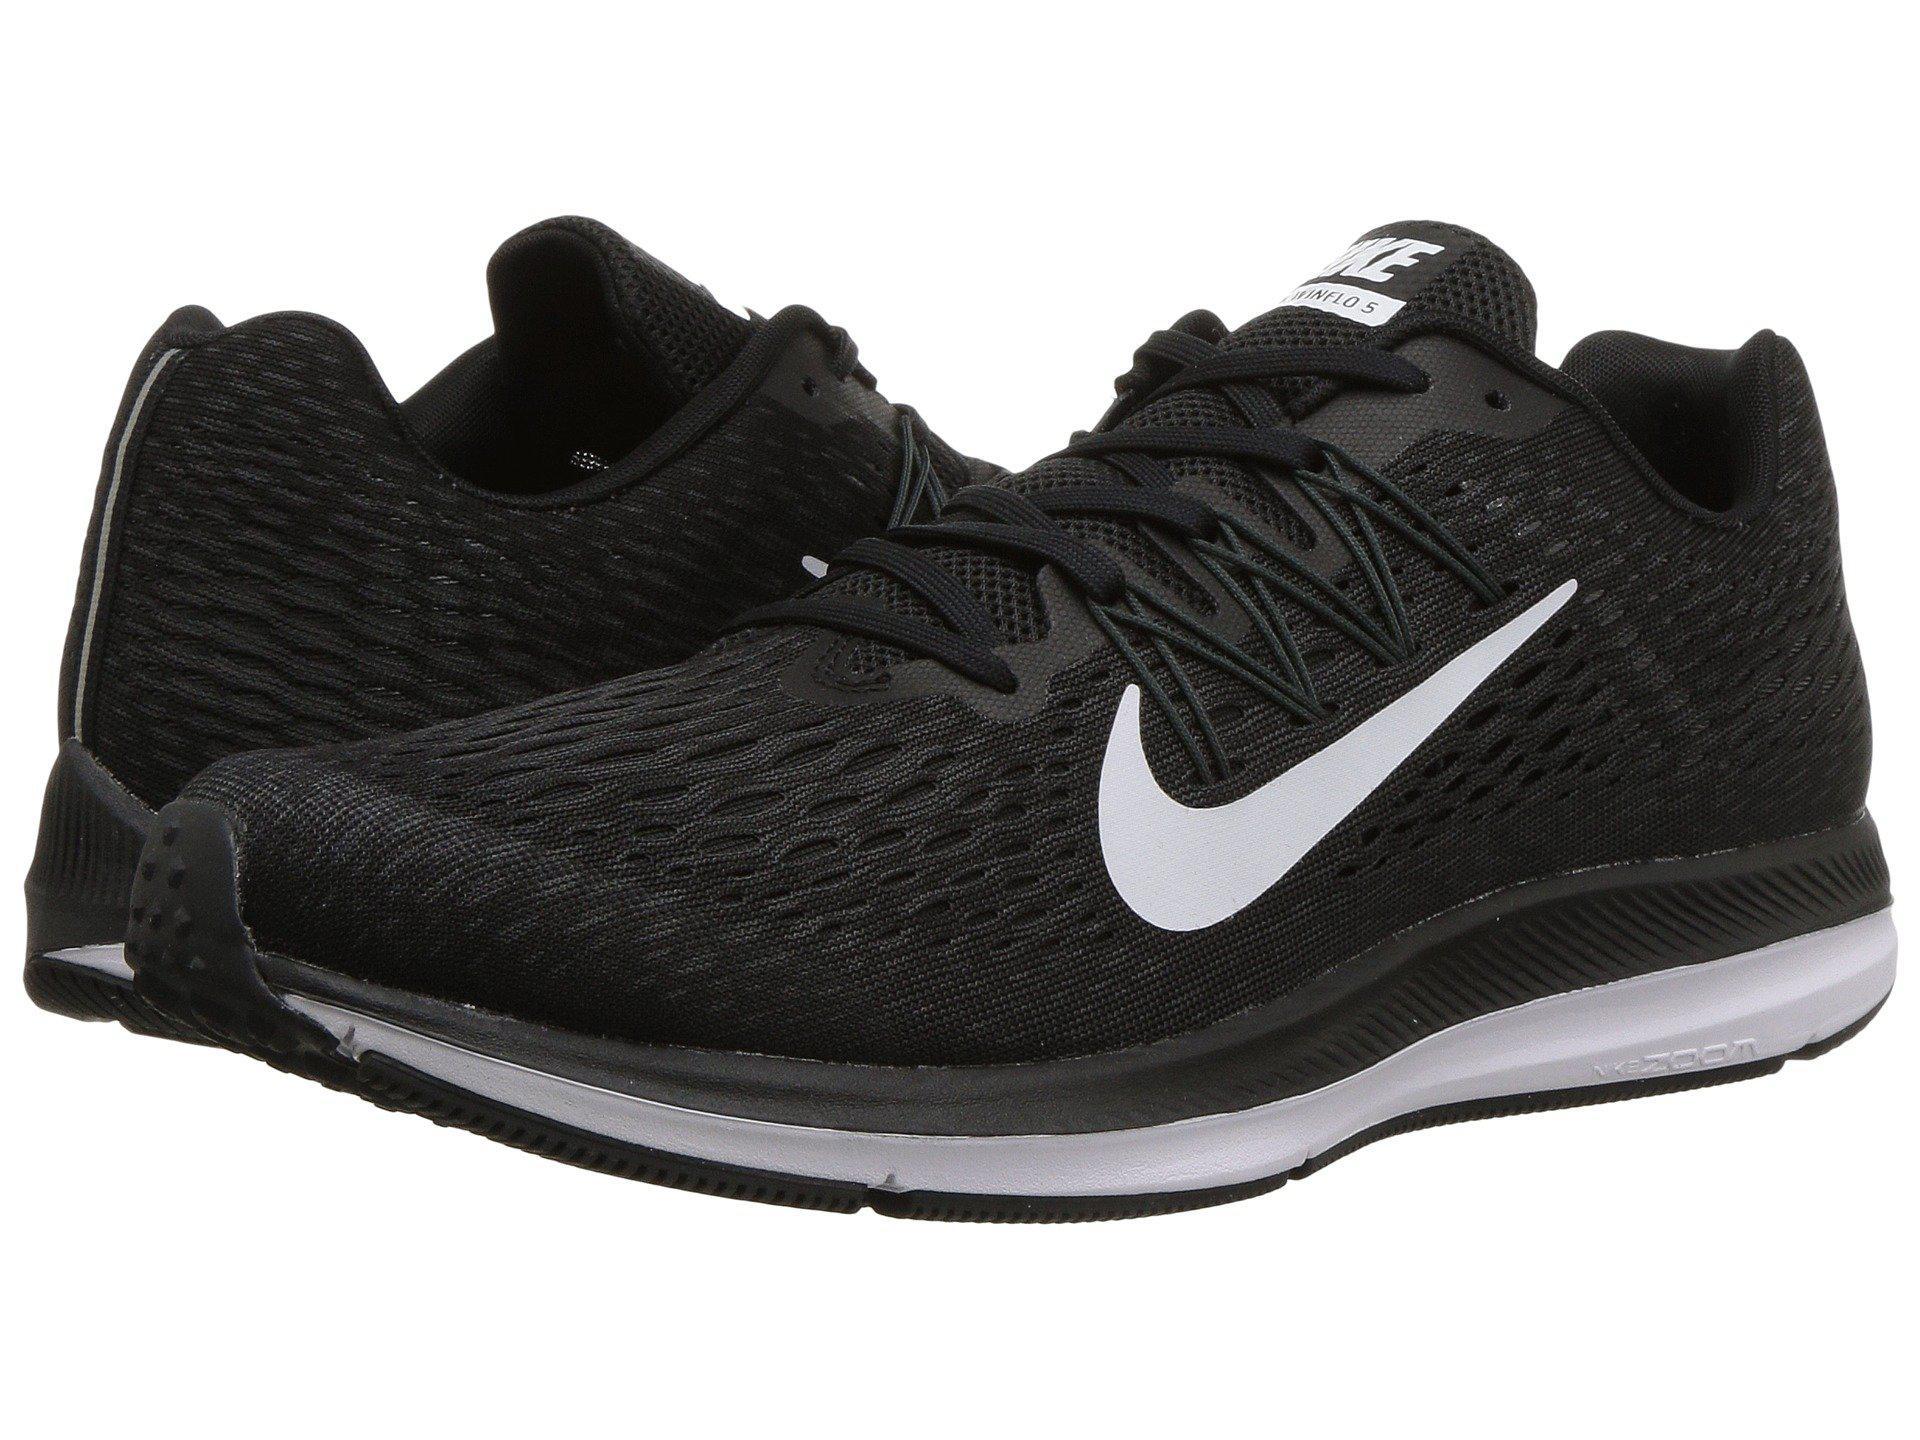 official photos d7292 7babd Nike. Air Zoom Winflo 5 ...